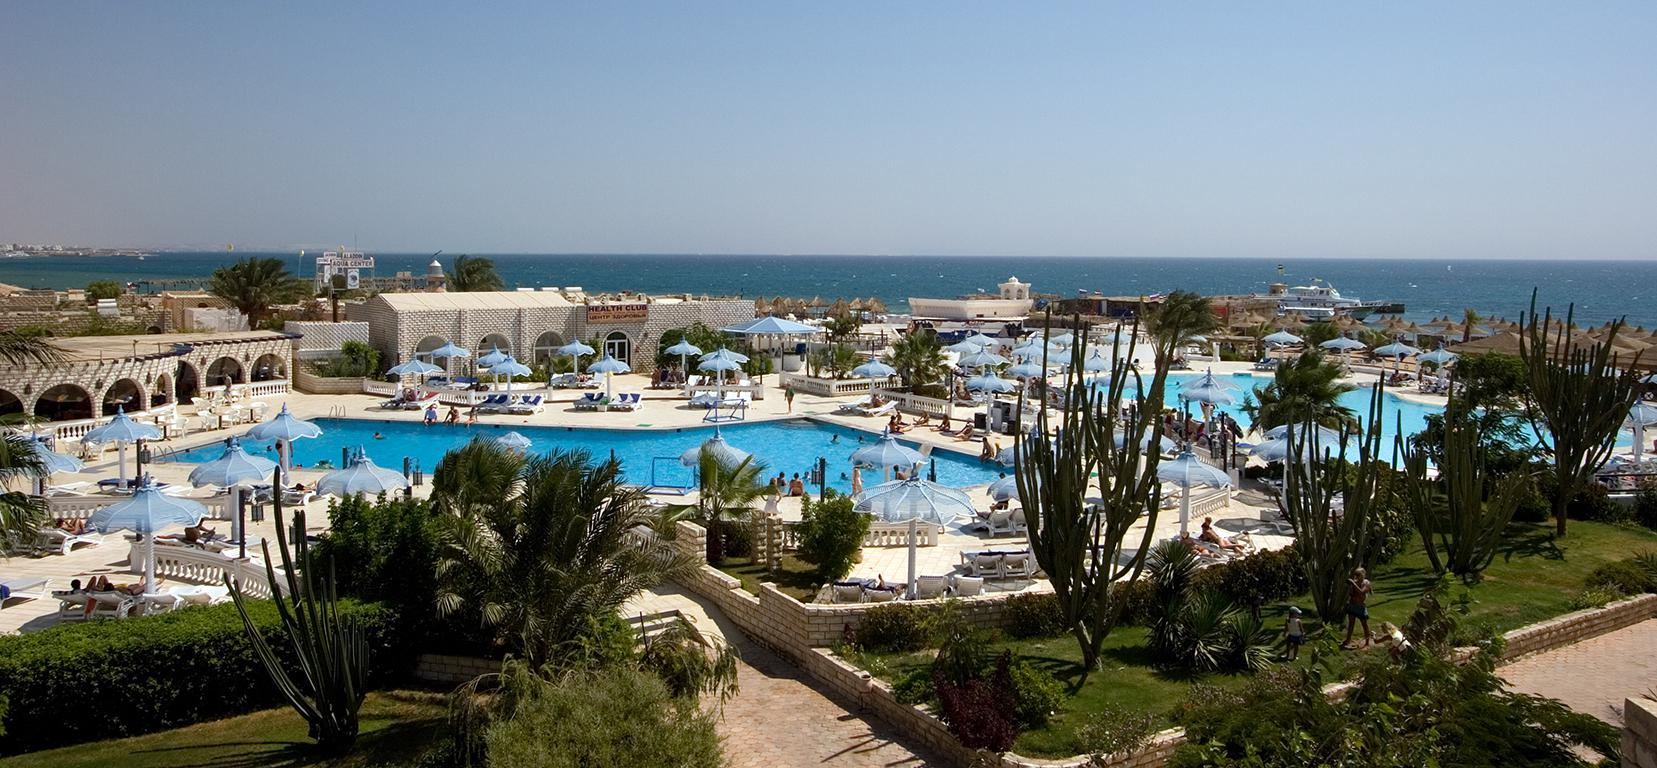 Meer info over Hotel Aladdin Beach Resort  bij Sunweb zomer